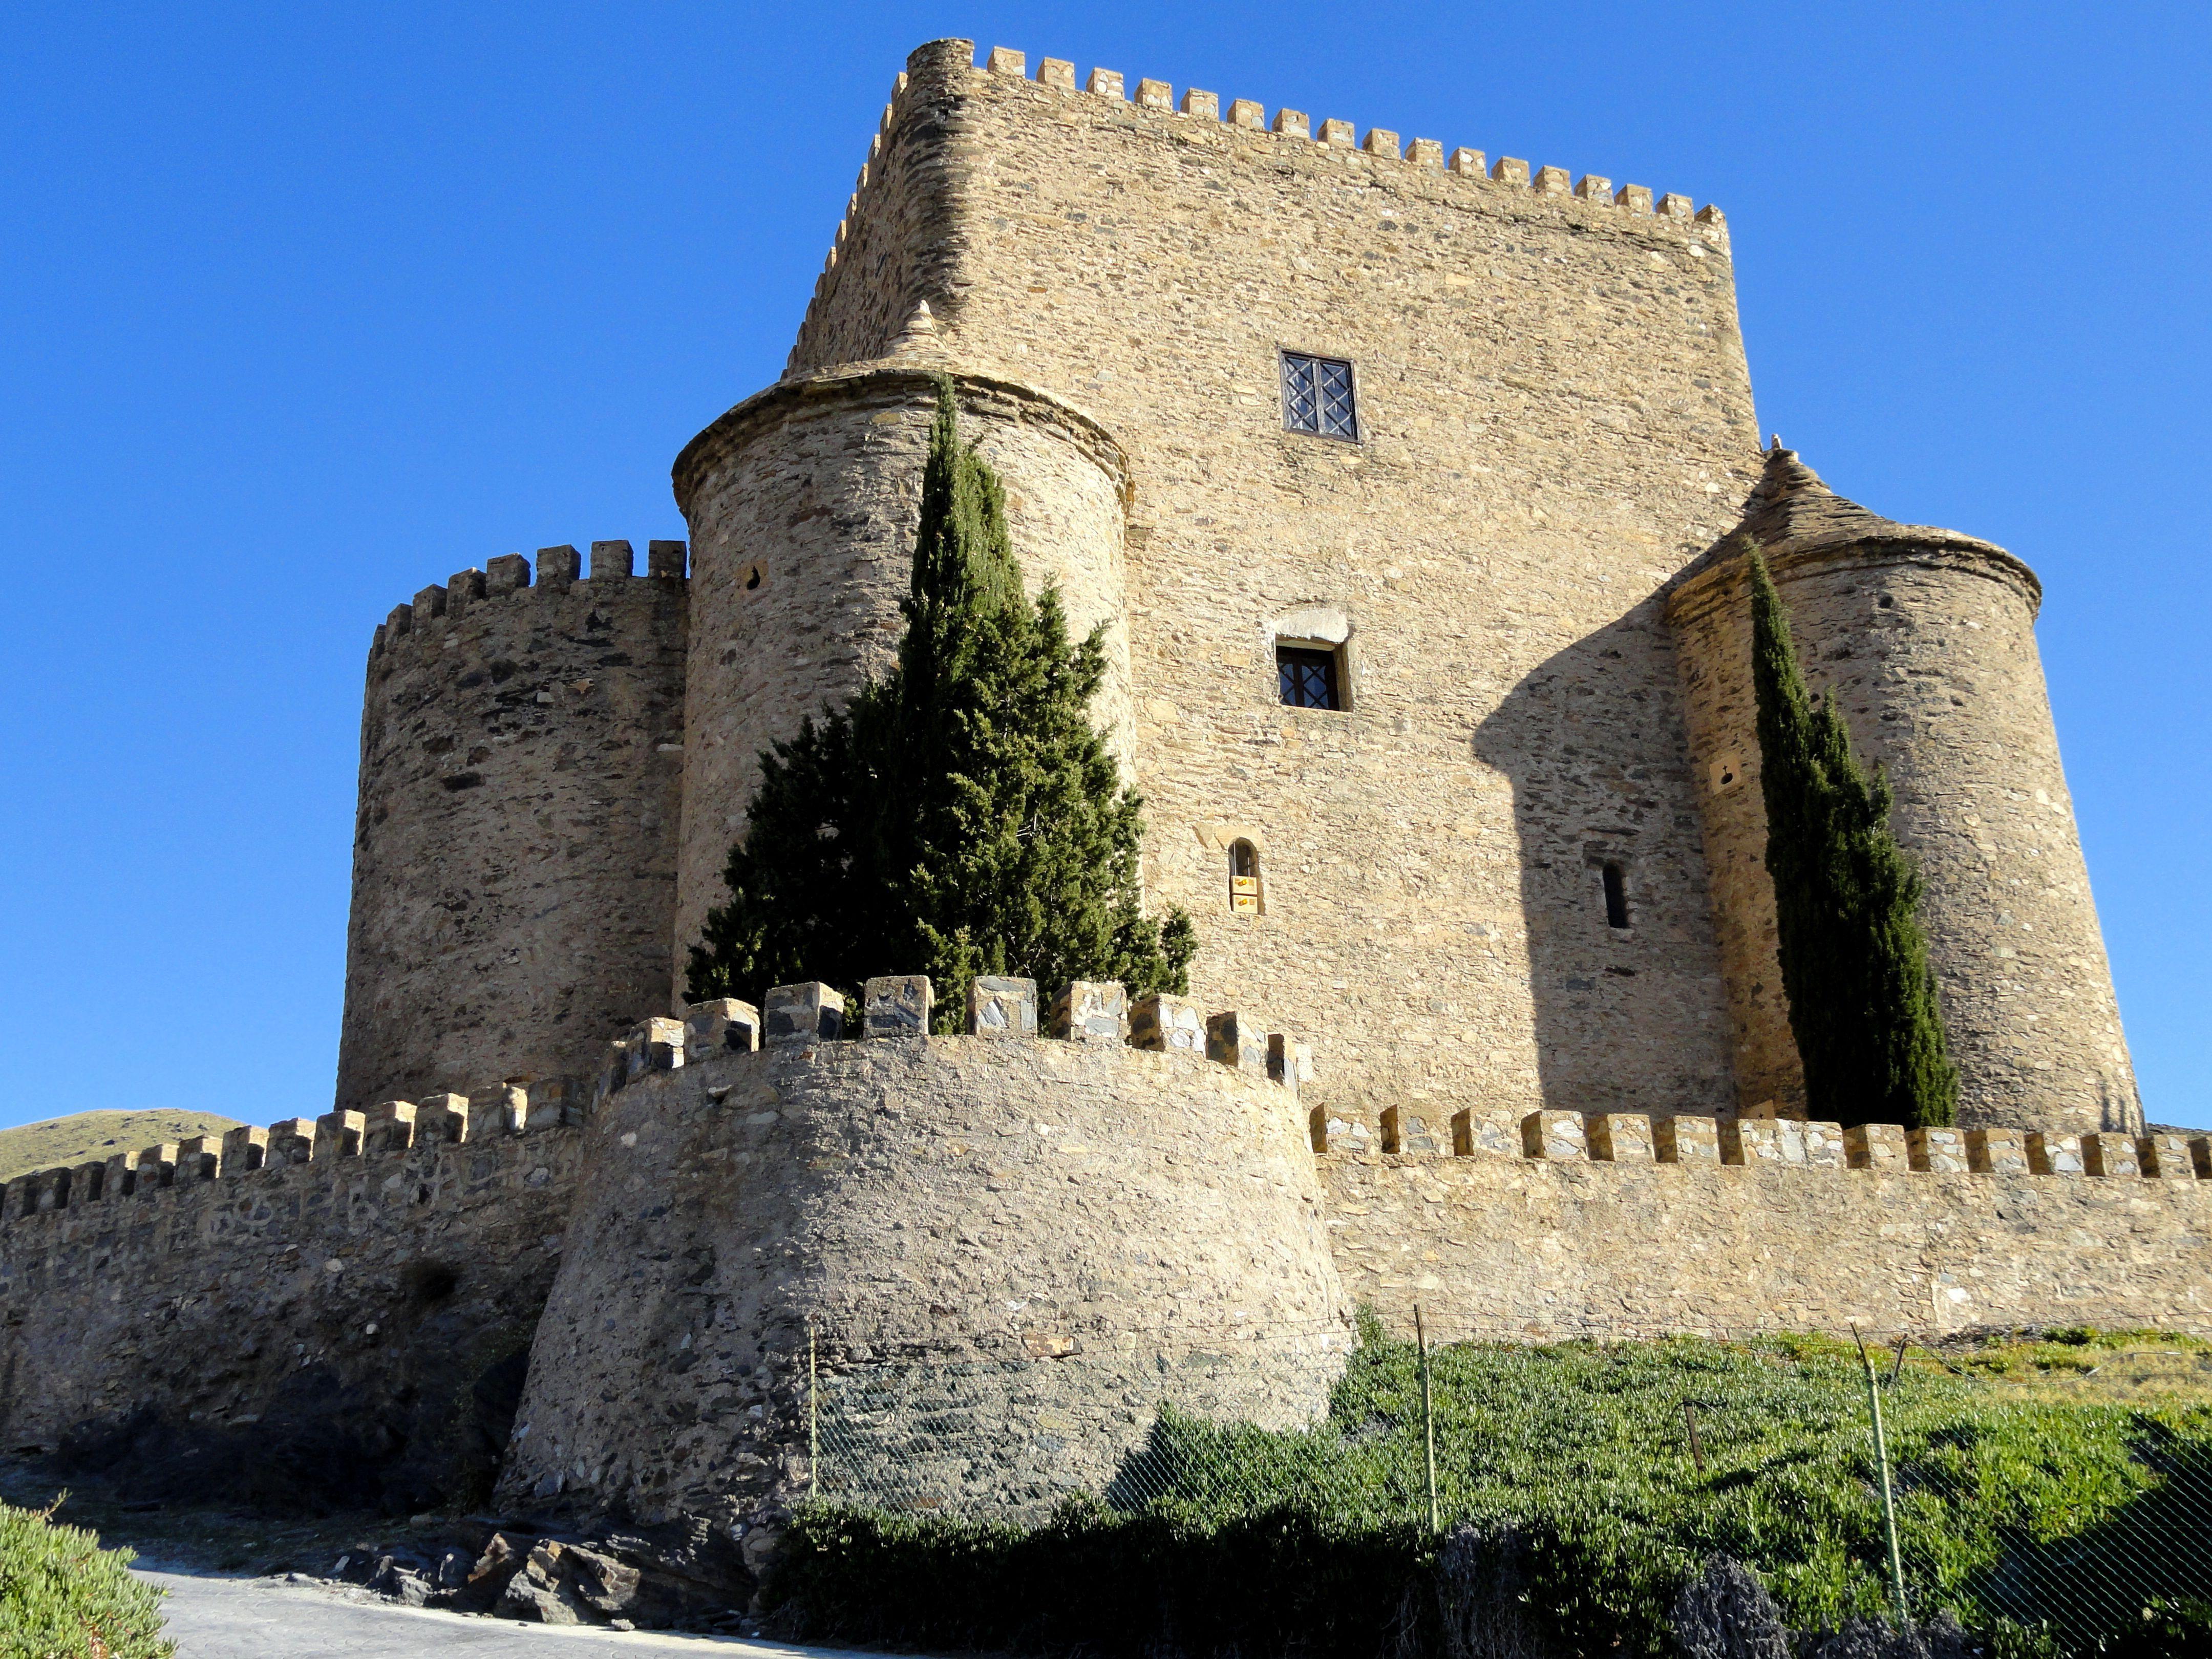 Castillo De La Cueva Hd Wallpaper